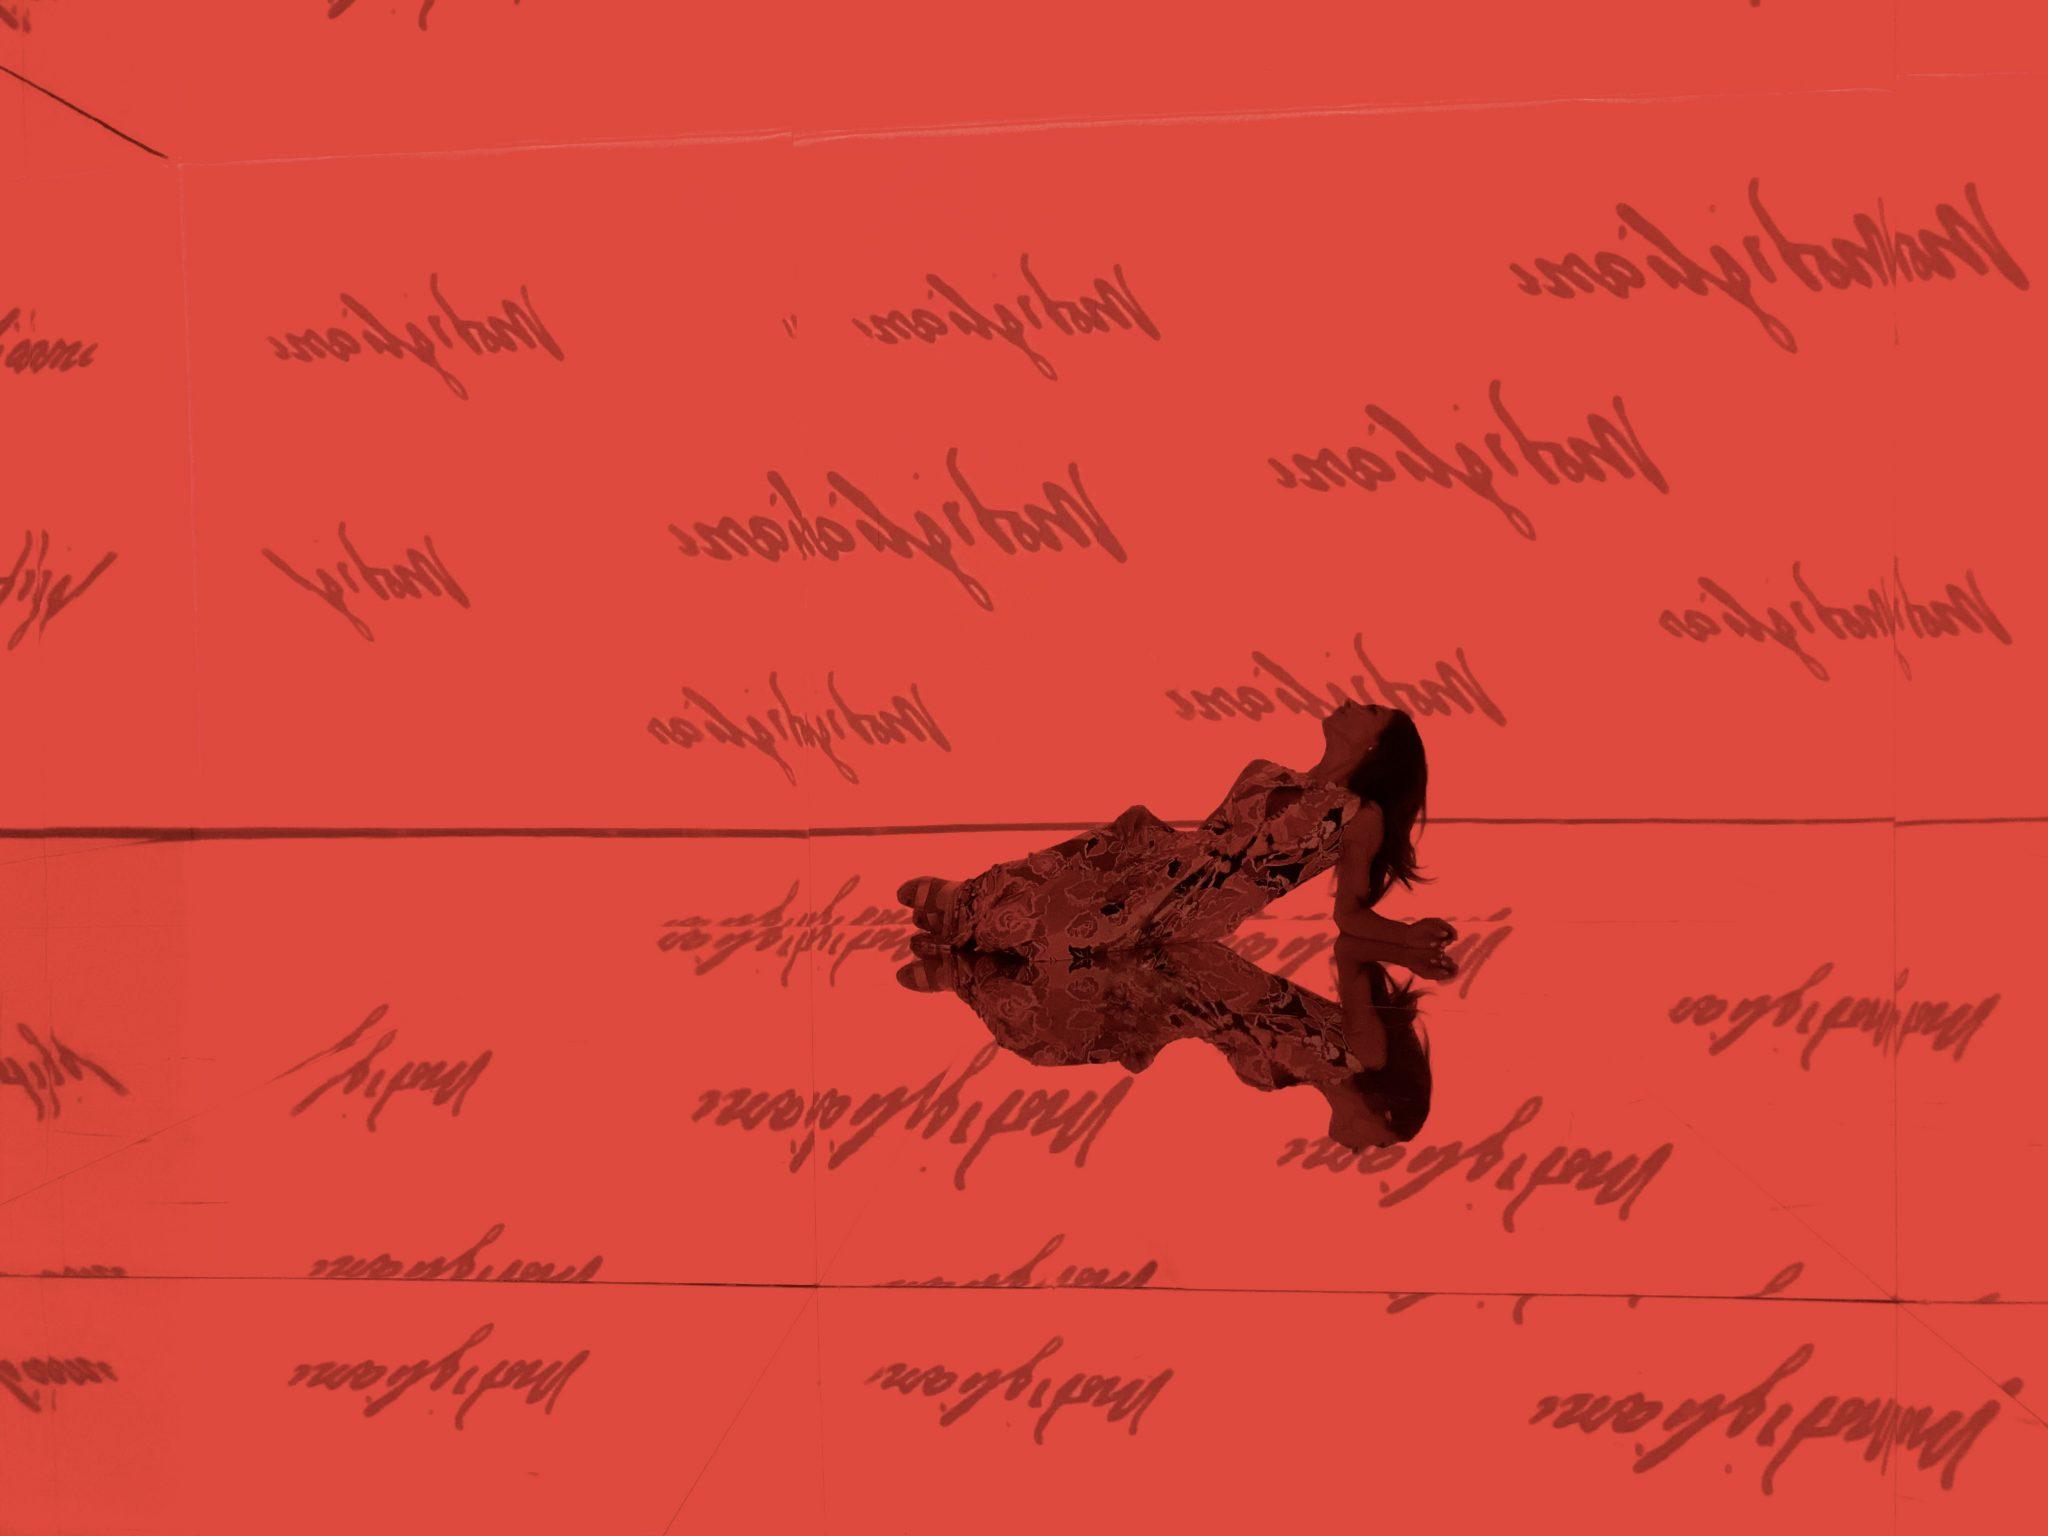 "#SELFIEADARTE ""M'arRosso"" @AmedeoModigliani #ModiglianiArtExperience @MUDEC #Milano @CleliaPatella"